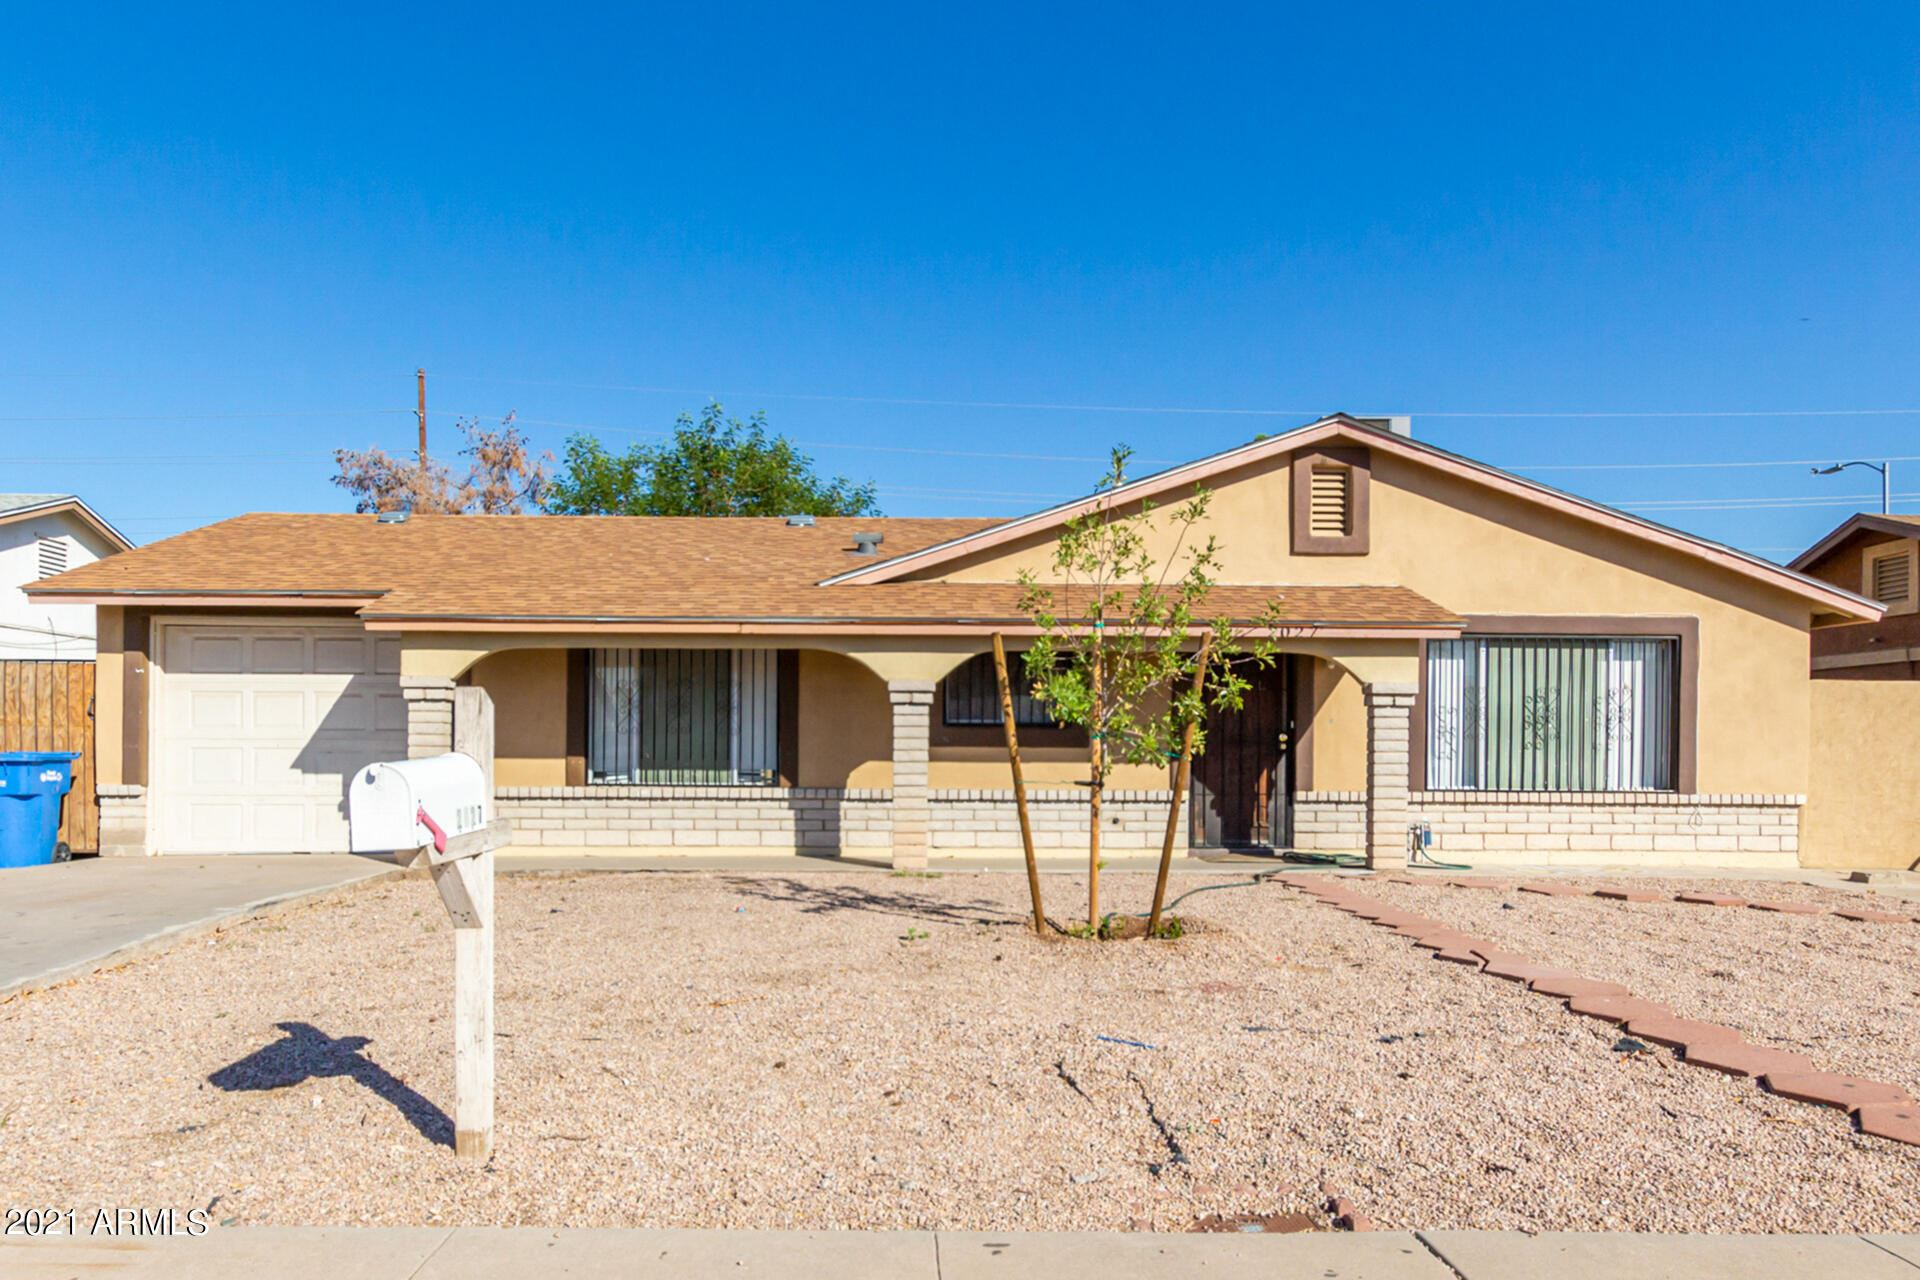 Photo of 2027 N 51ST Drive, Phoenix, AZ 85035 (MLS # 6307765)